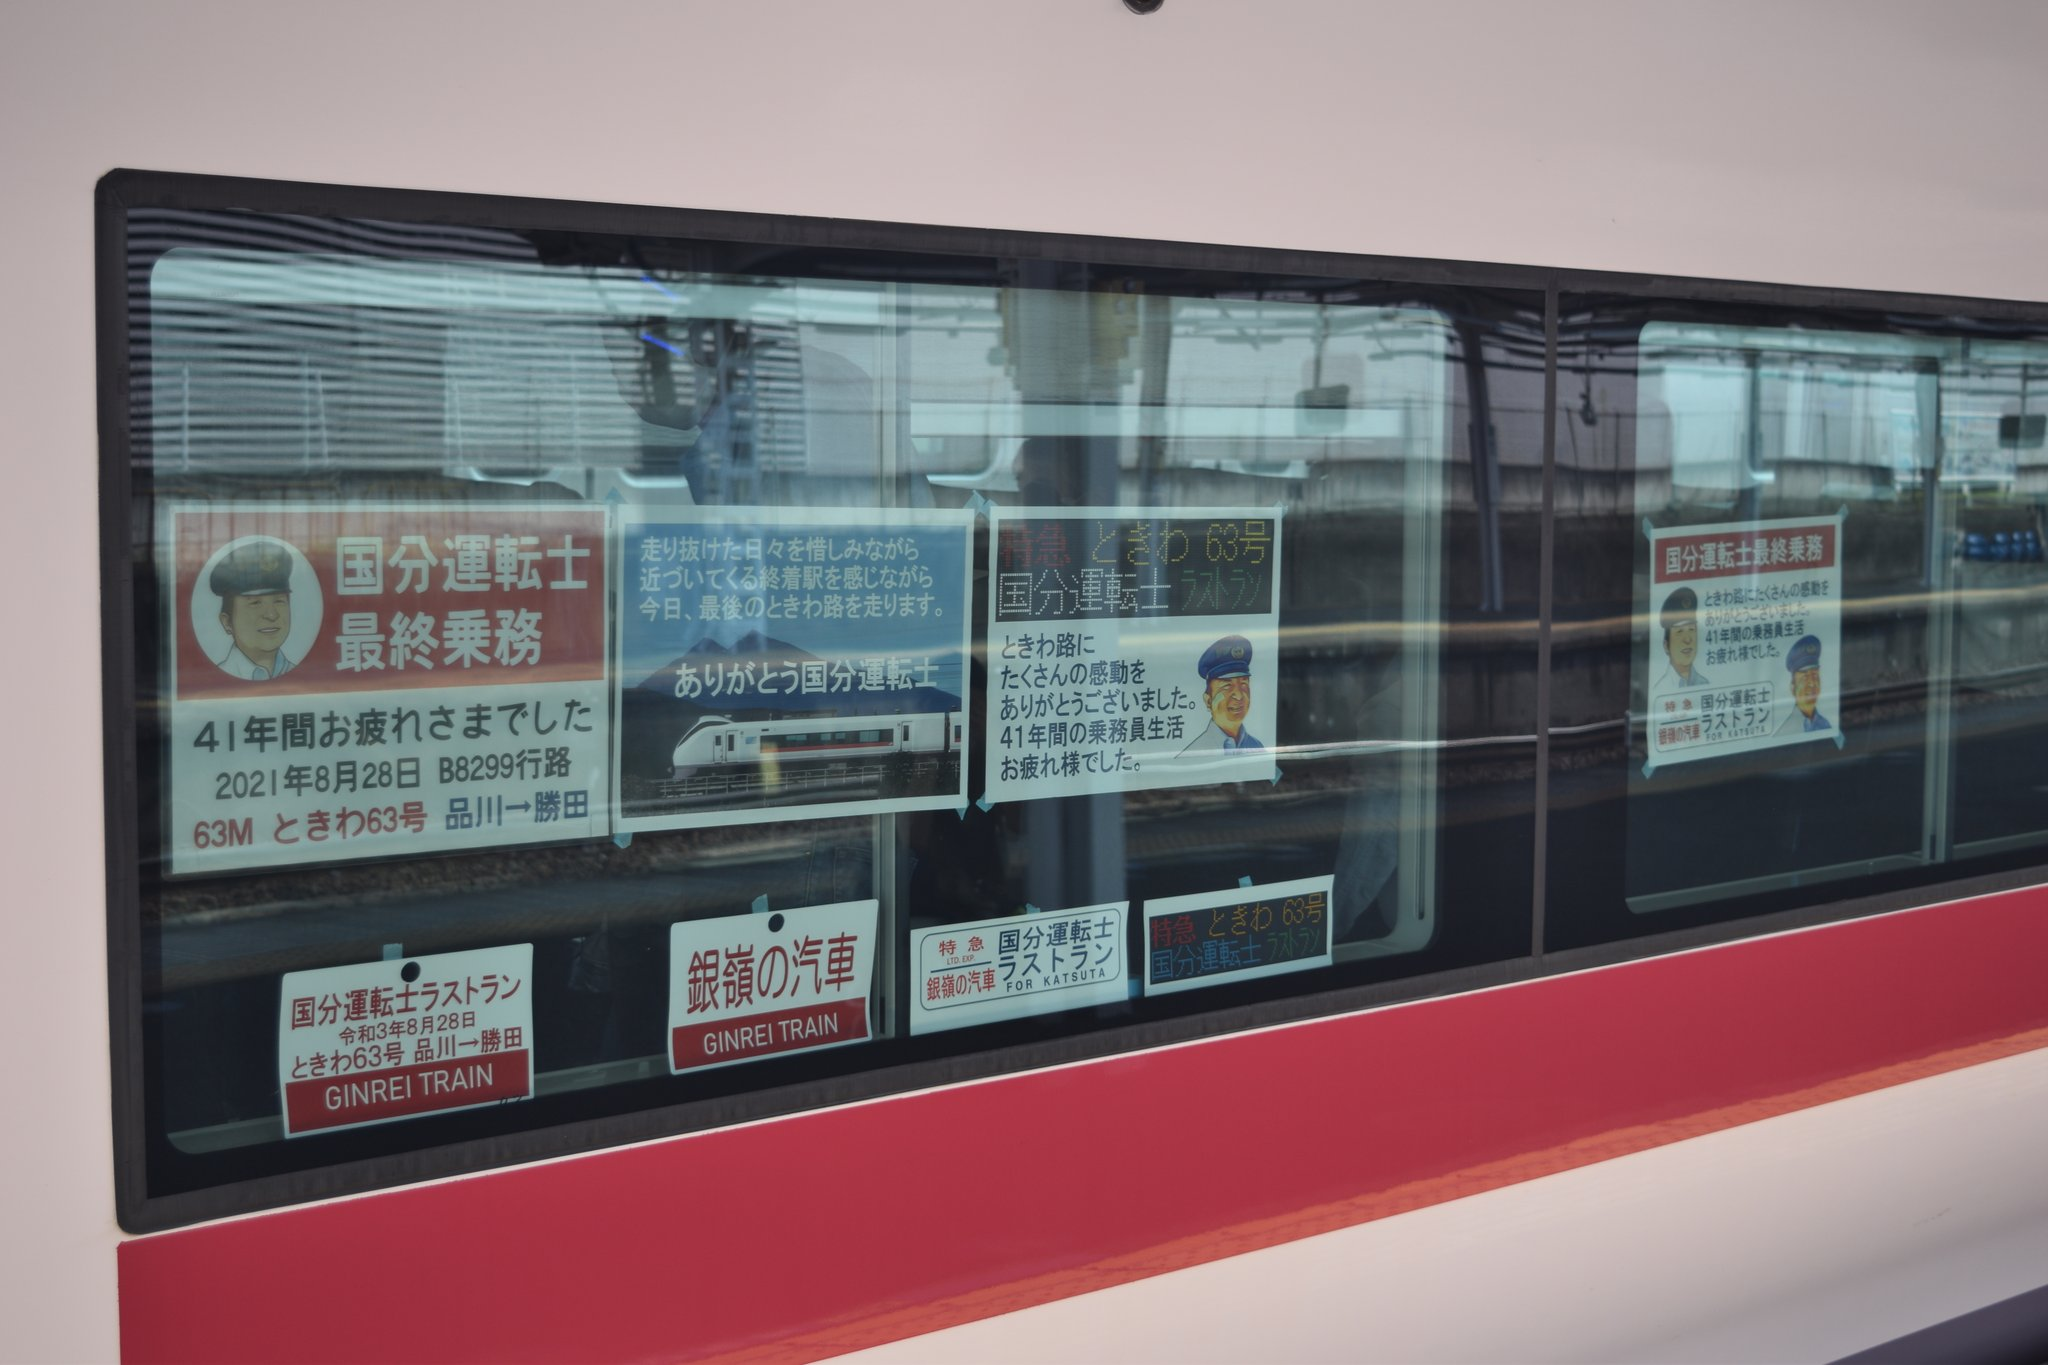 【JR東日本】運転士最終乗務の出迎えに会社がブチ切れ 「言語道断で到底看過できない、徹底的に調査し厳正に処分する」